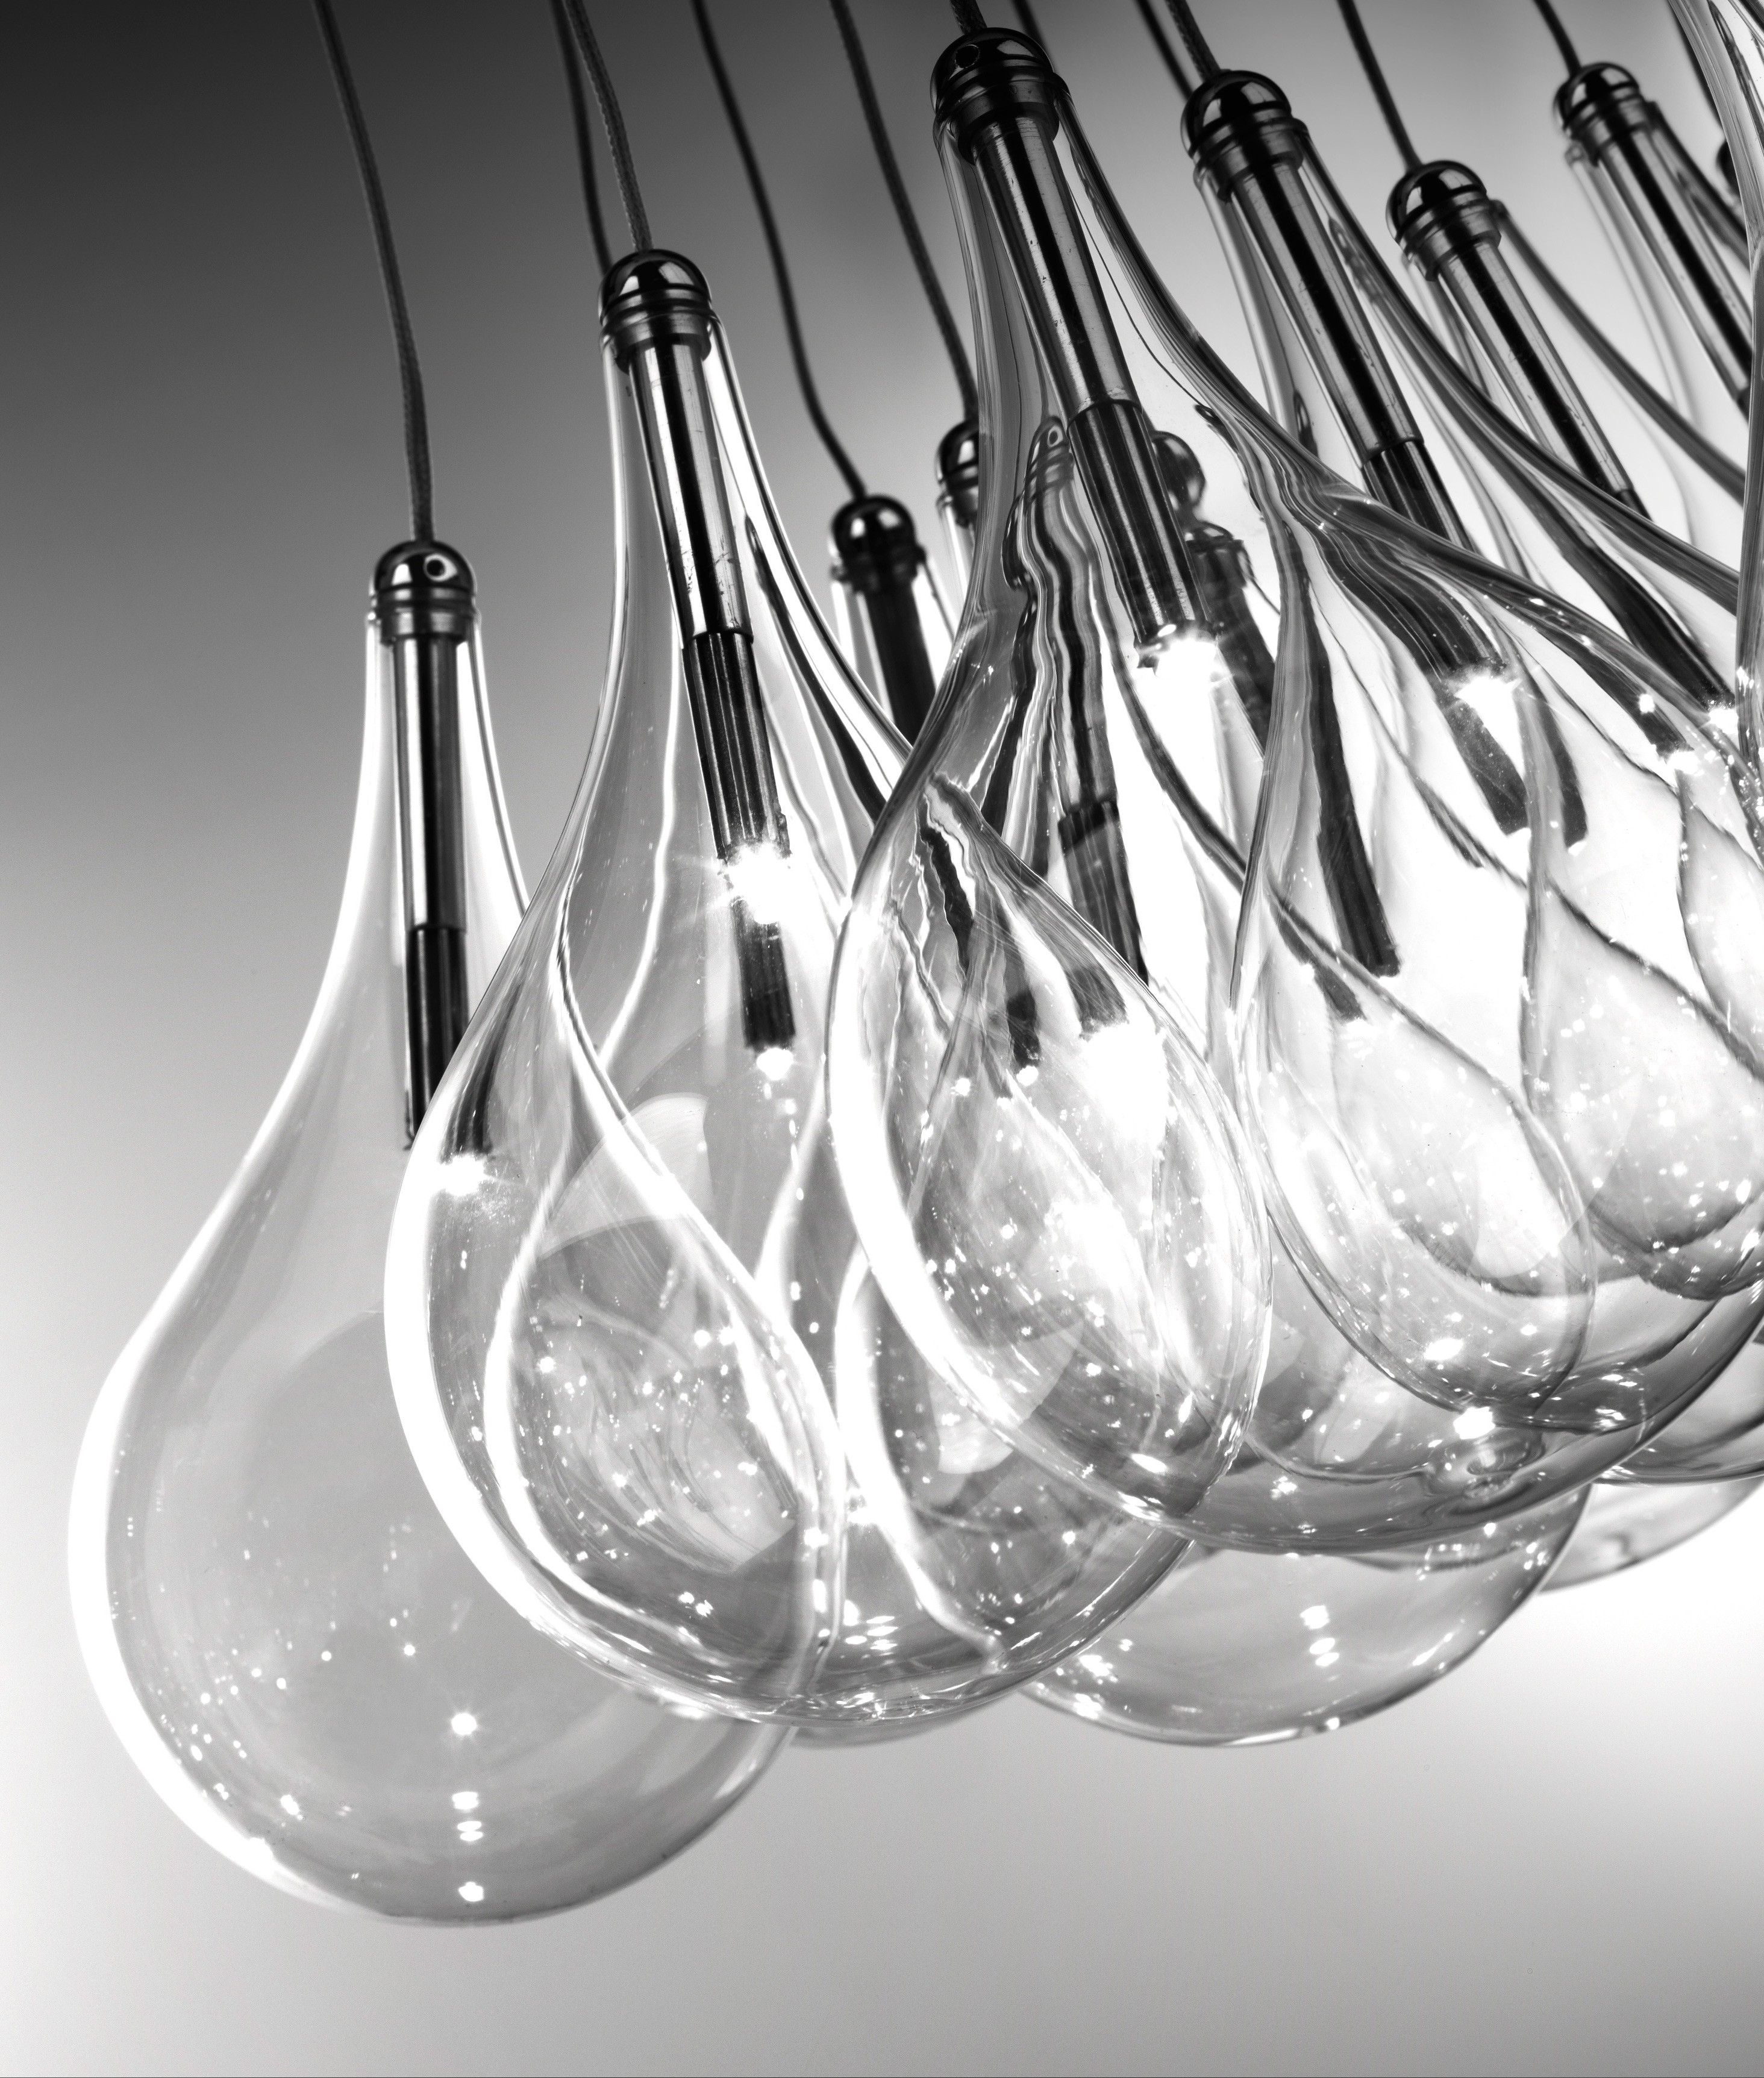 Teardrop Glass 16 Light Square Cer Pendant Choose 12v G4 Or Led Lamps